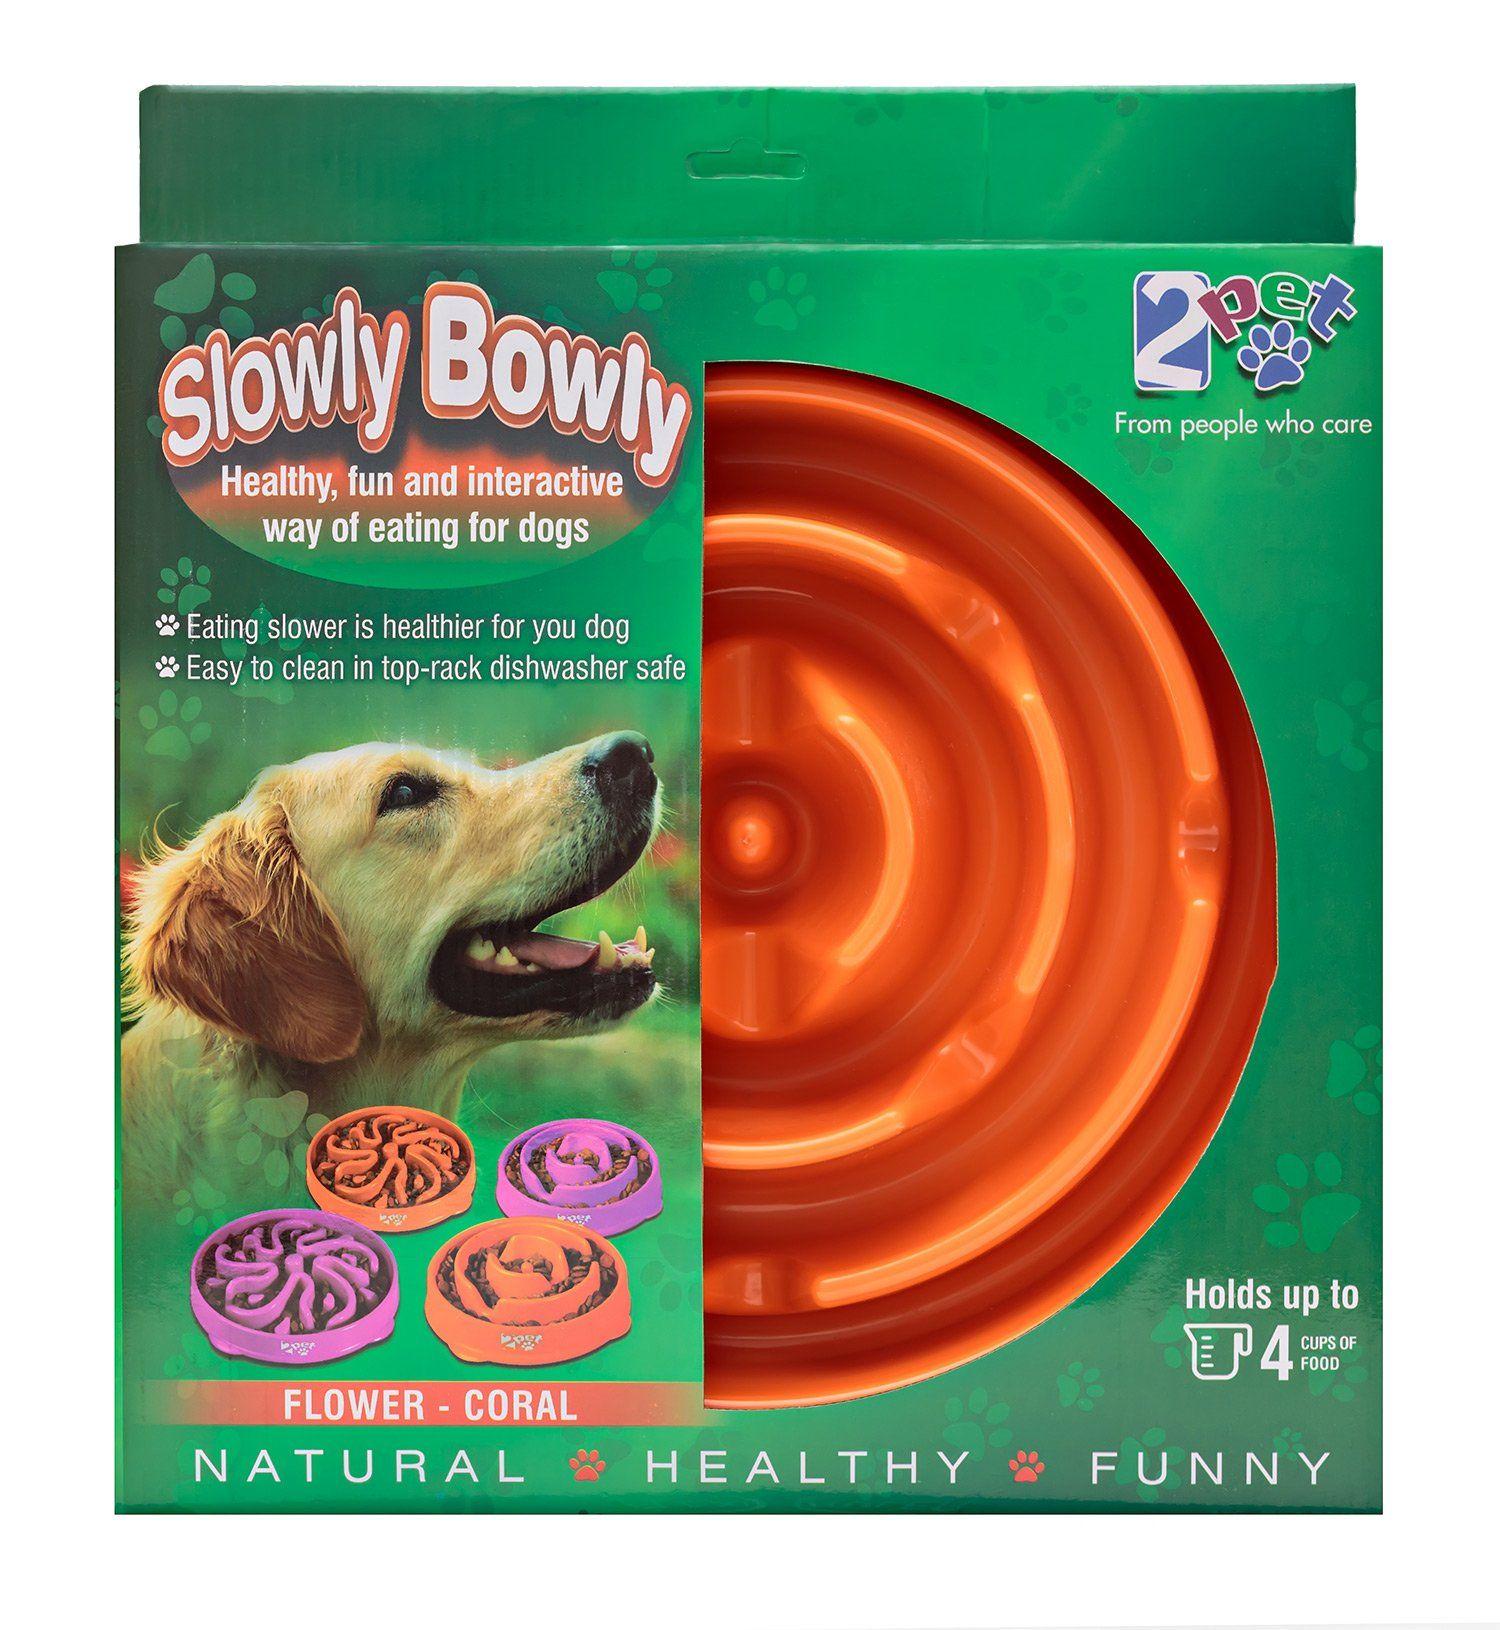 Slow Feed Dog Bowl Slowly Bowly By 2pet Fun Interactive Dog Dish